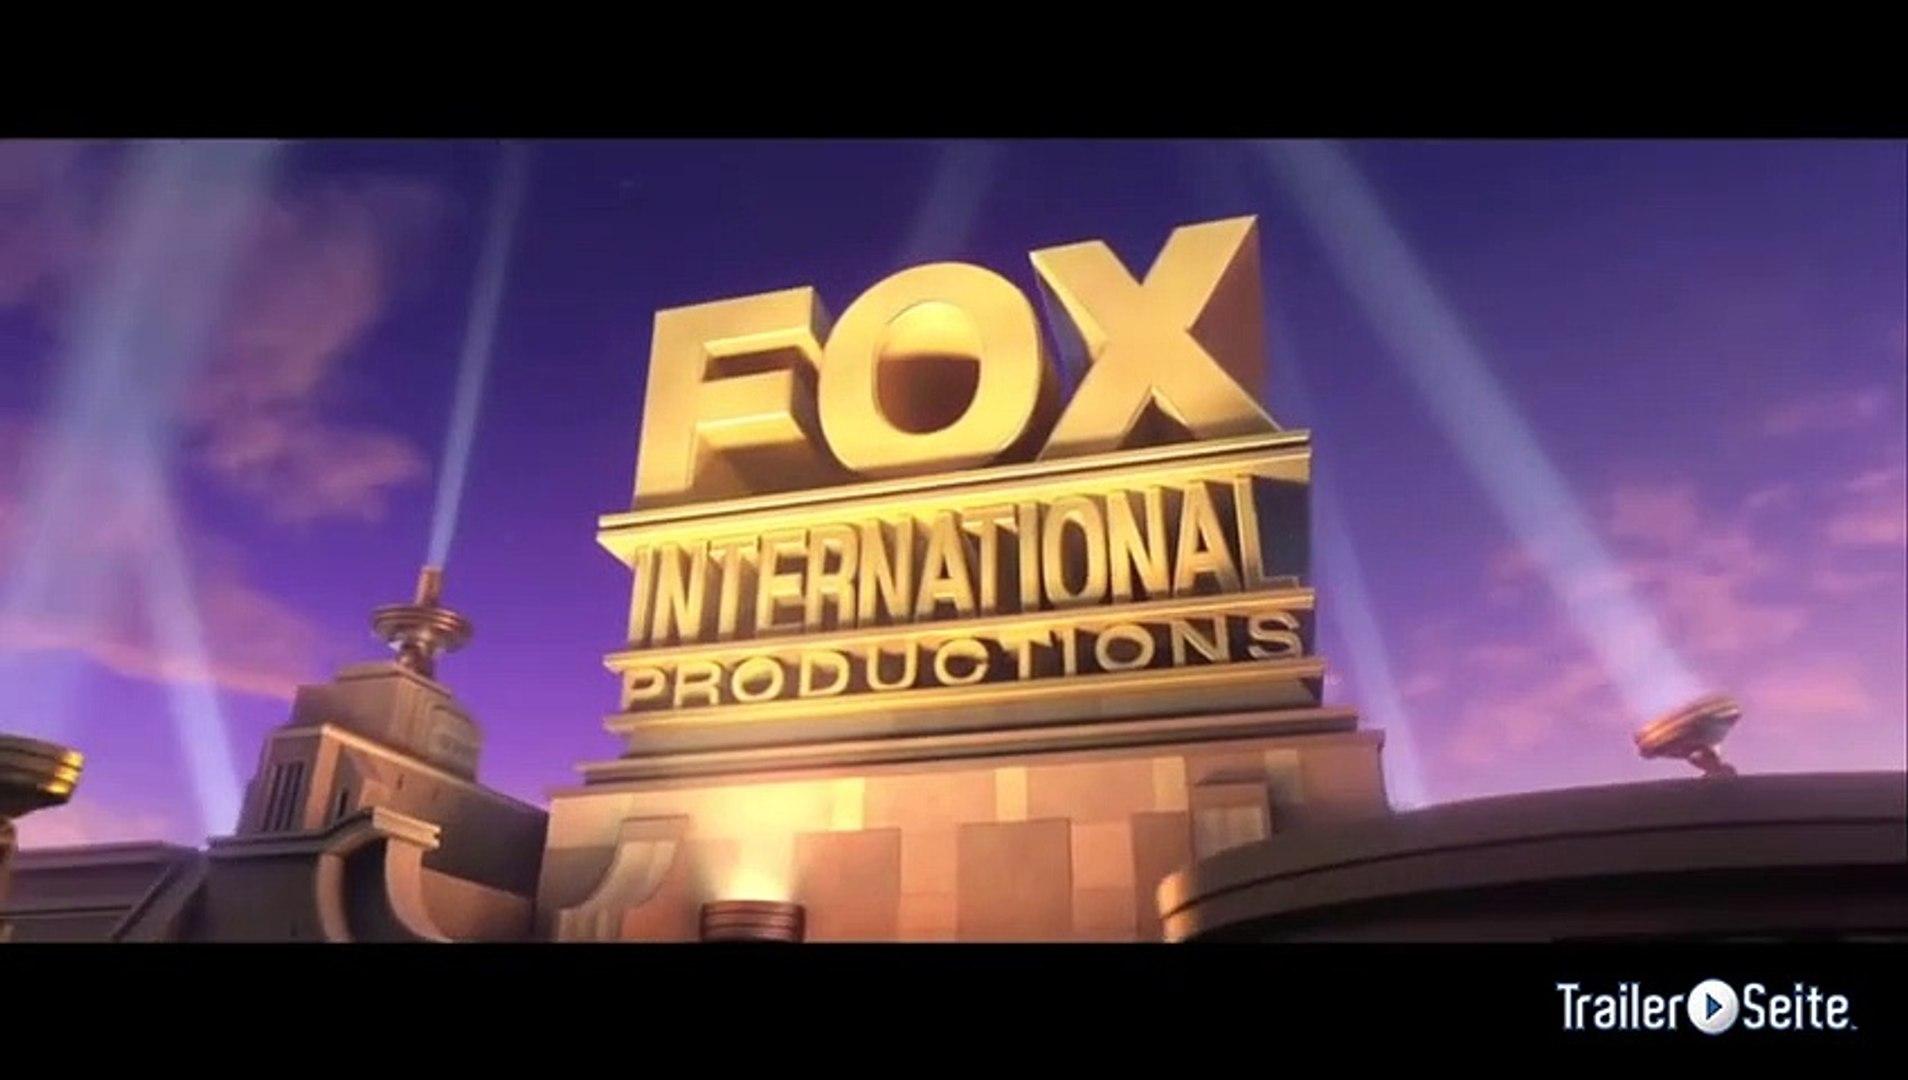 Amapola Trailer (2015) - Engl. Trailer